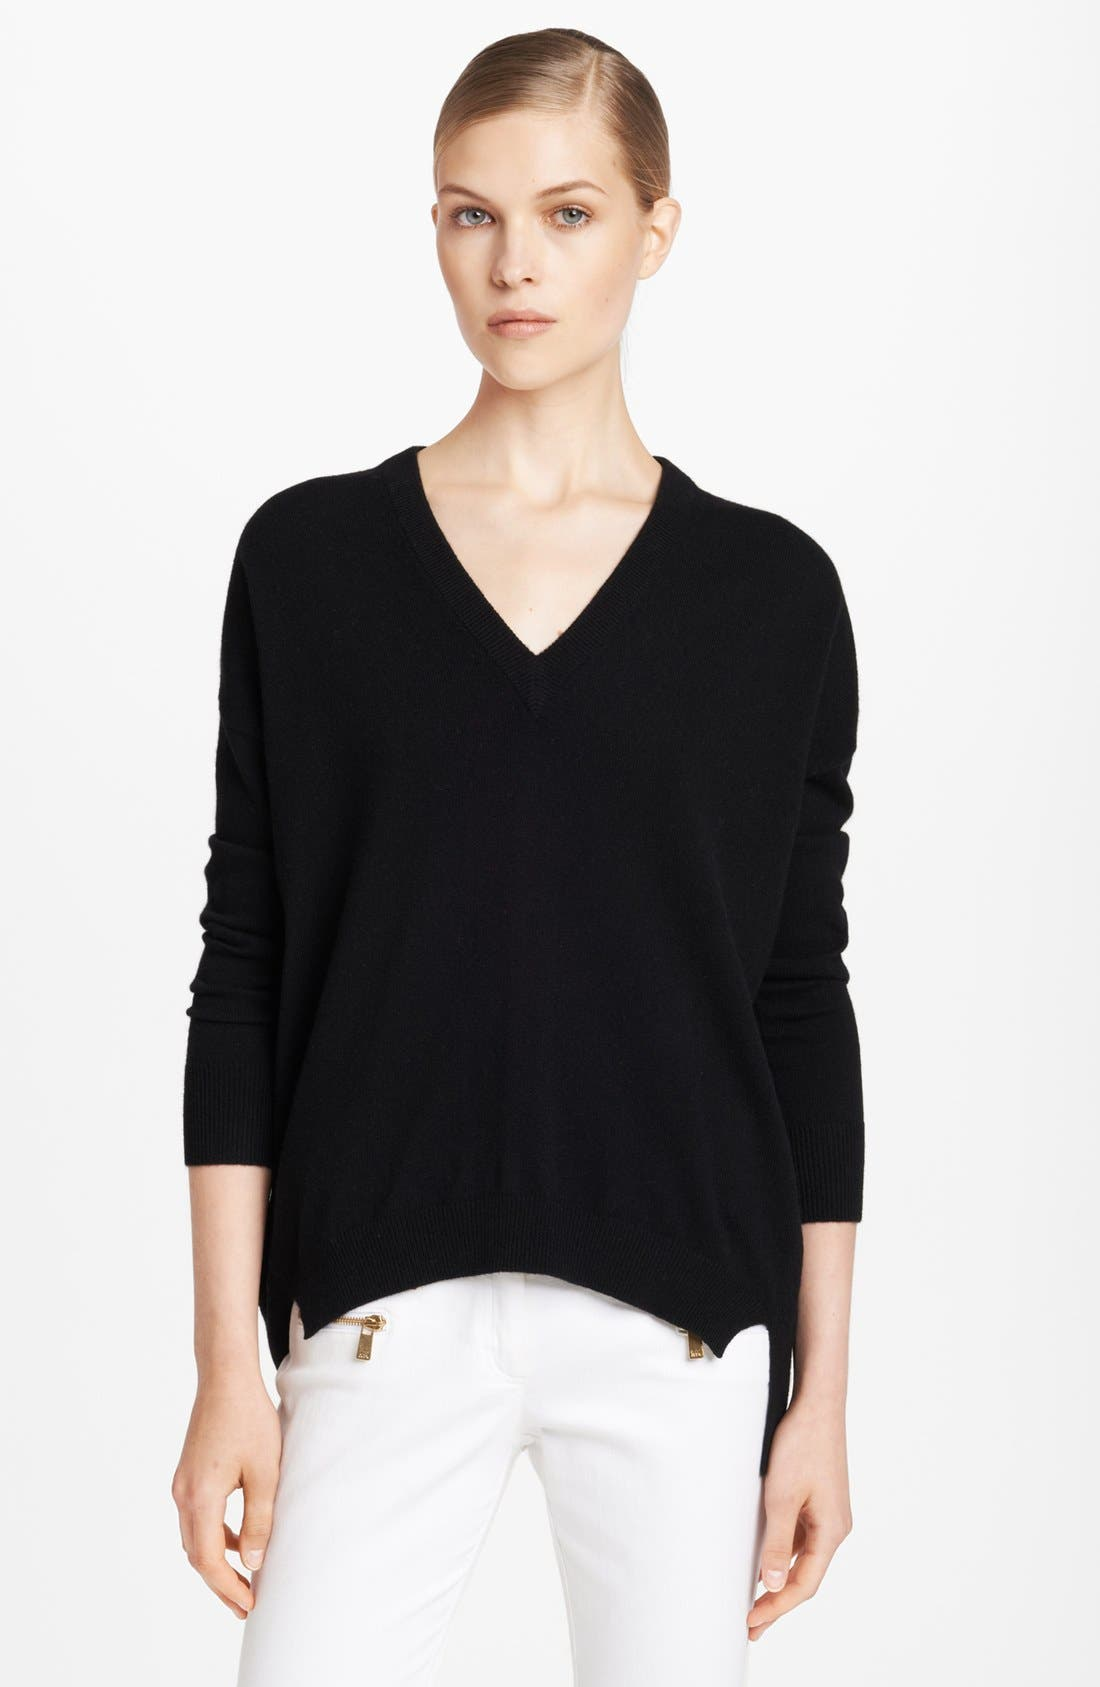 Main Image - Michael Kors Cashmere Knit Tunic